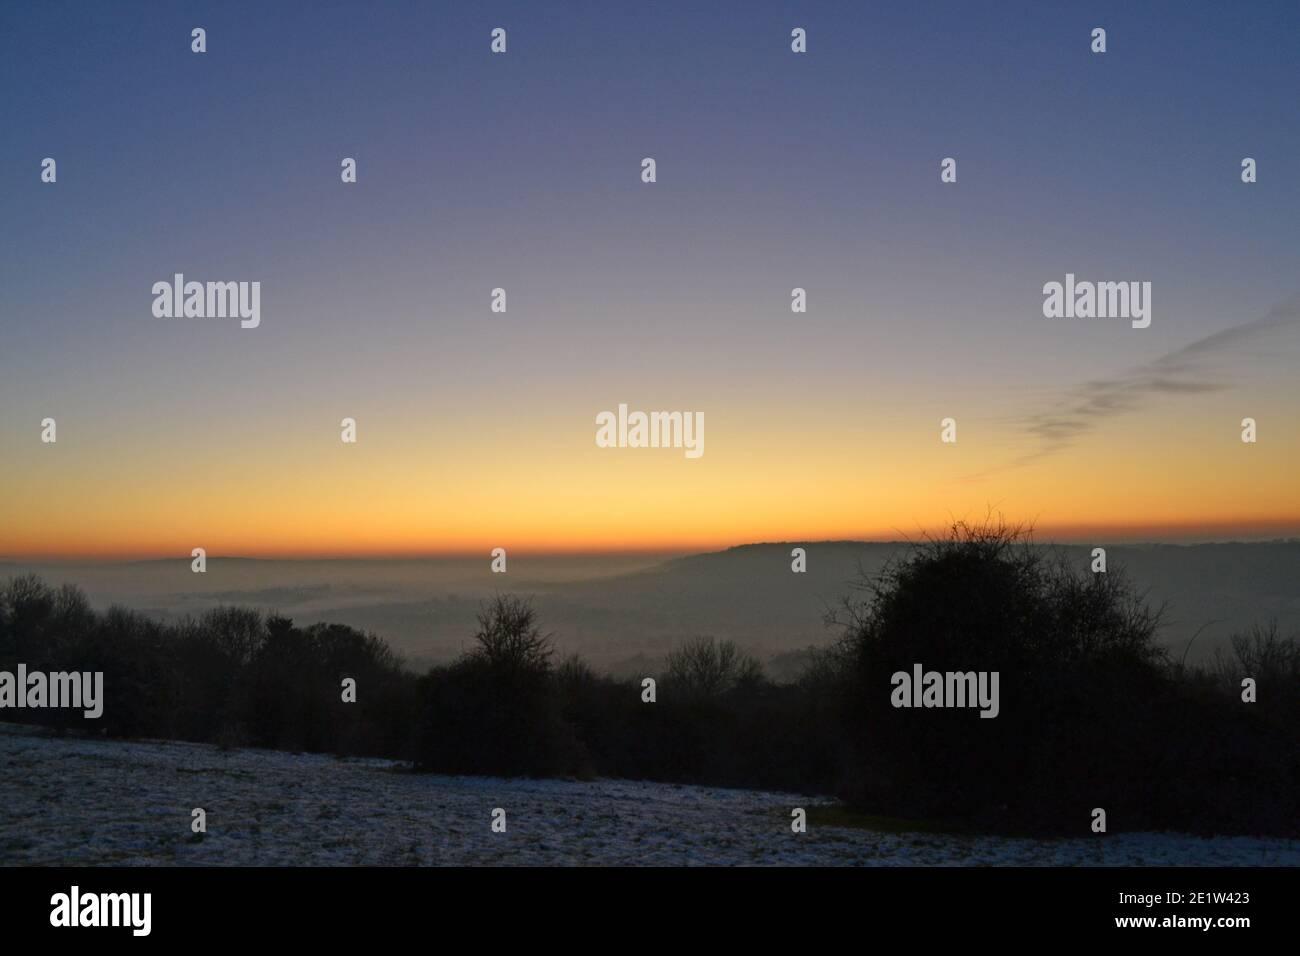 Dramatic sunset in misty winter light in the North Downs, Fackenden Down, in Kent, near Sevenoaks, crisp, clear sky above huge orange glow, blue sky Stock Photo